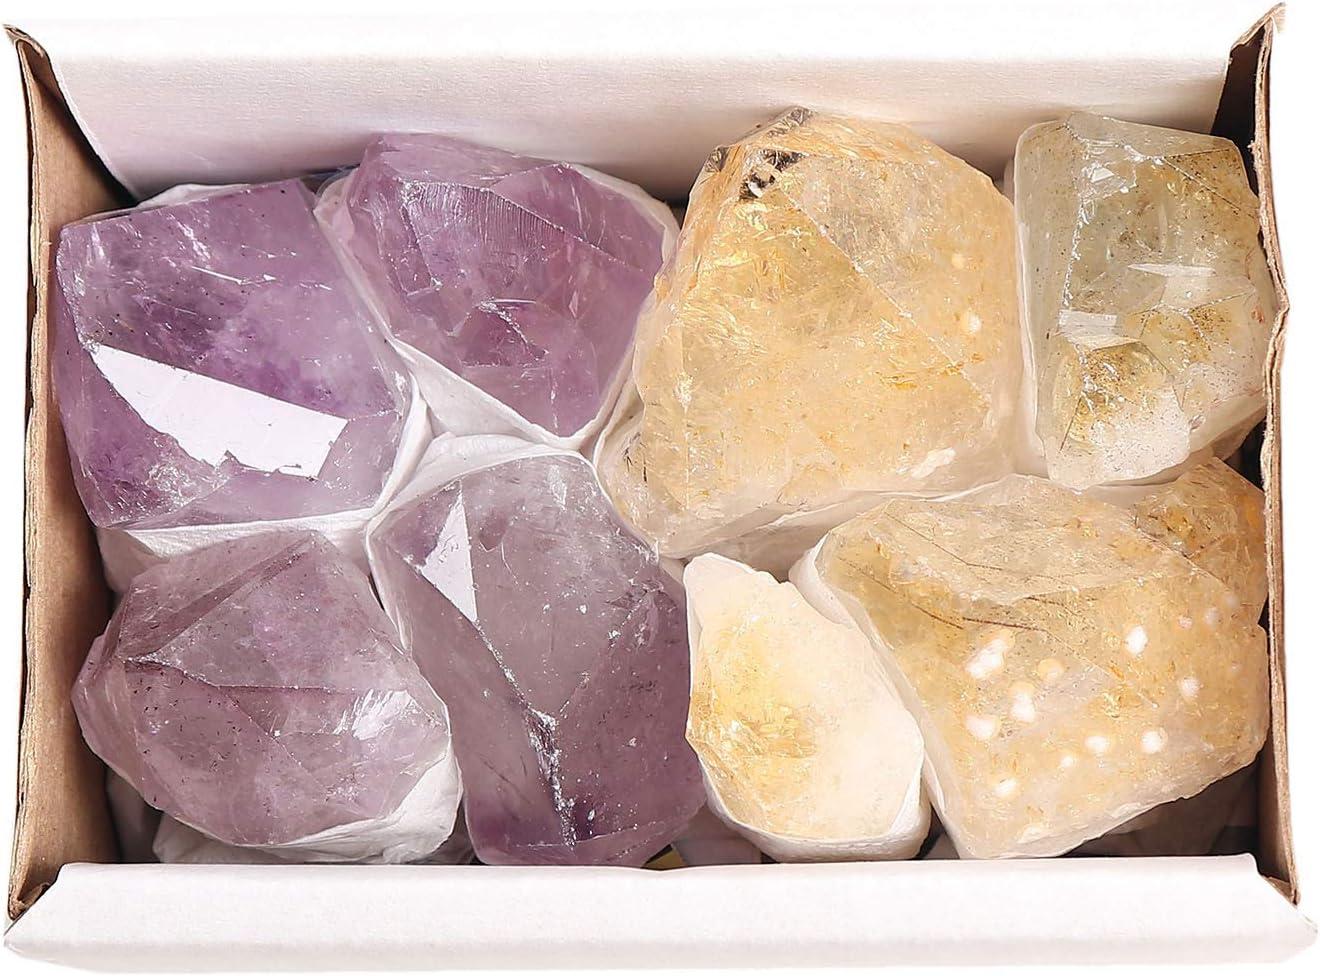 JIC Gem OFFicial Mix 8-10 pcs Amethyst Natura Max 56% OFF Stones Raw Points Citrine